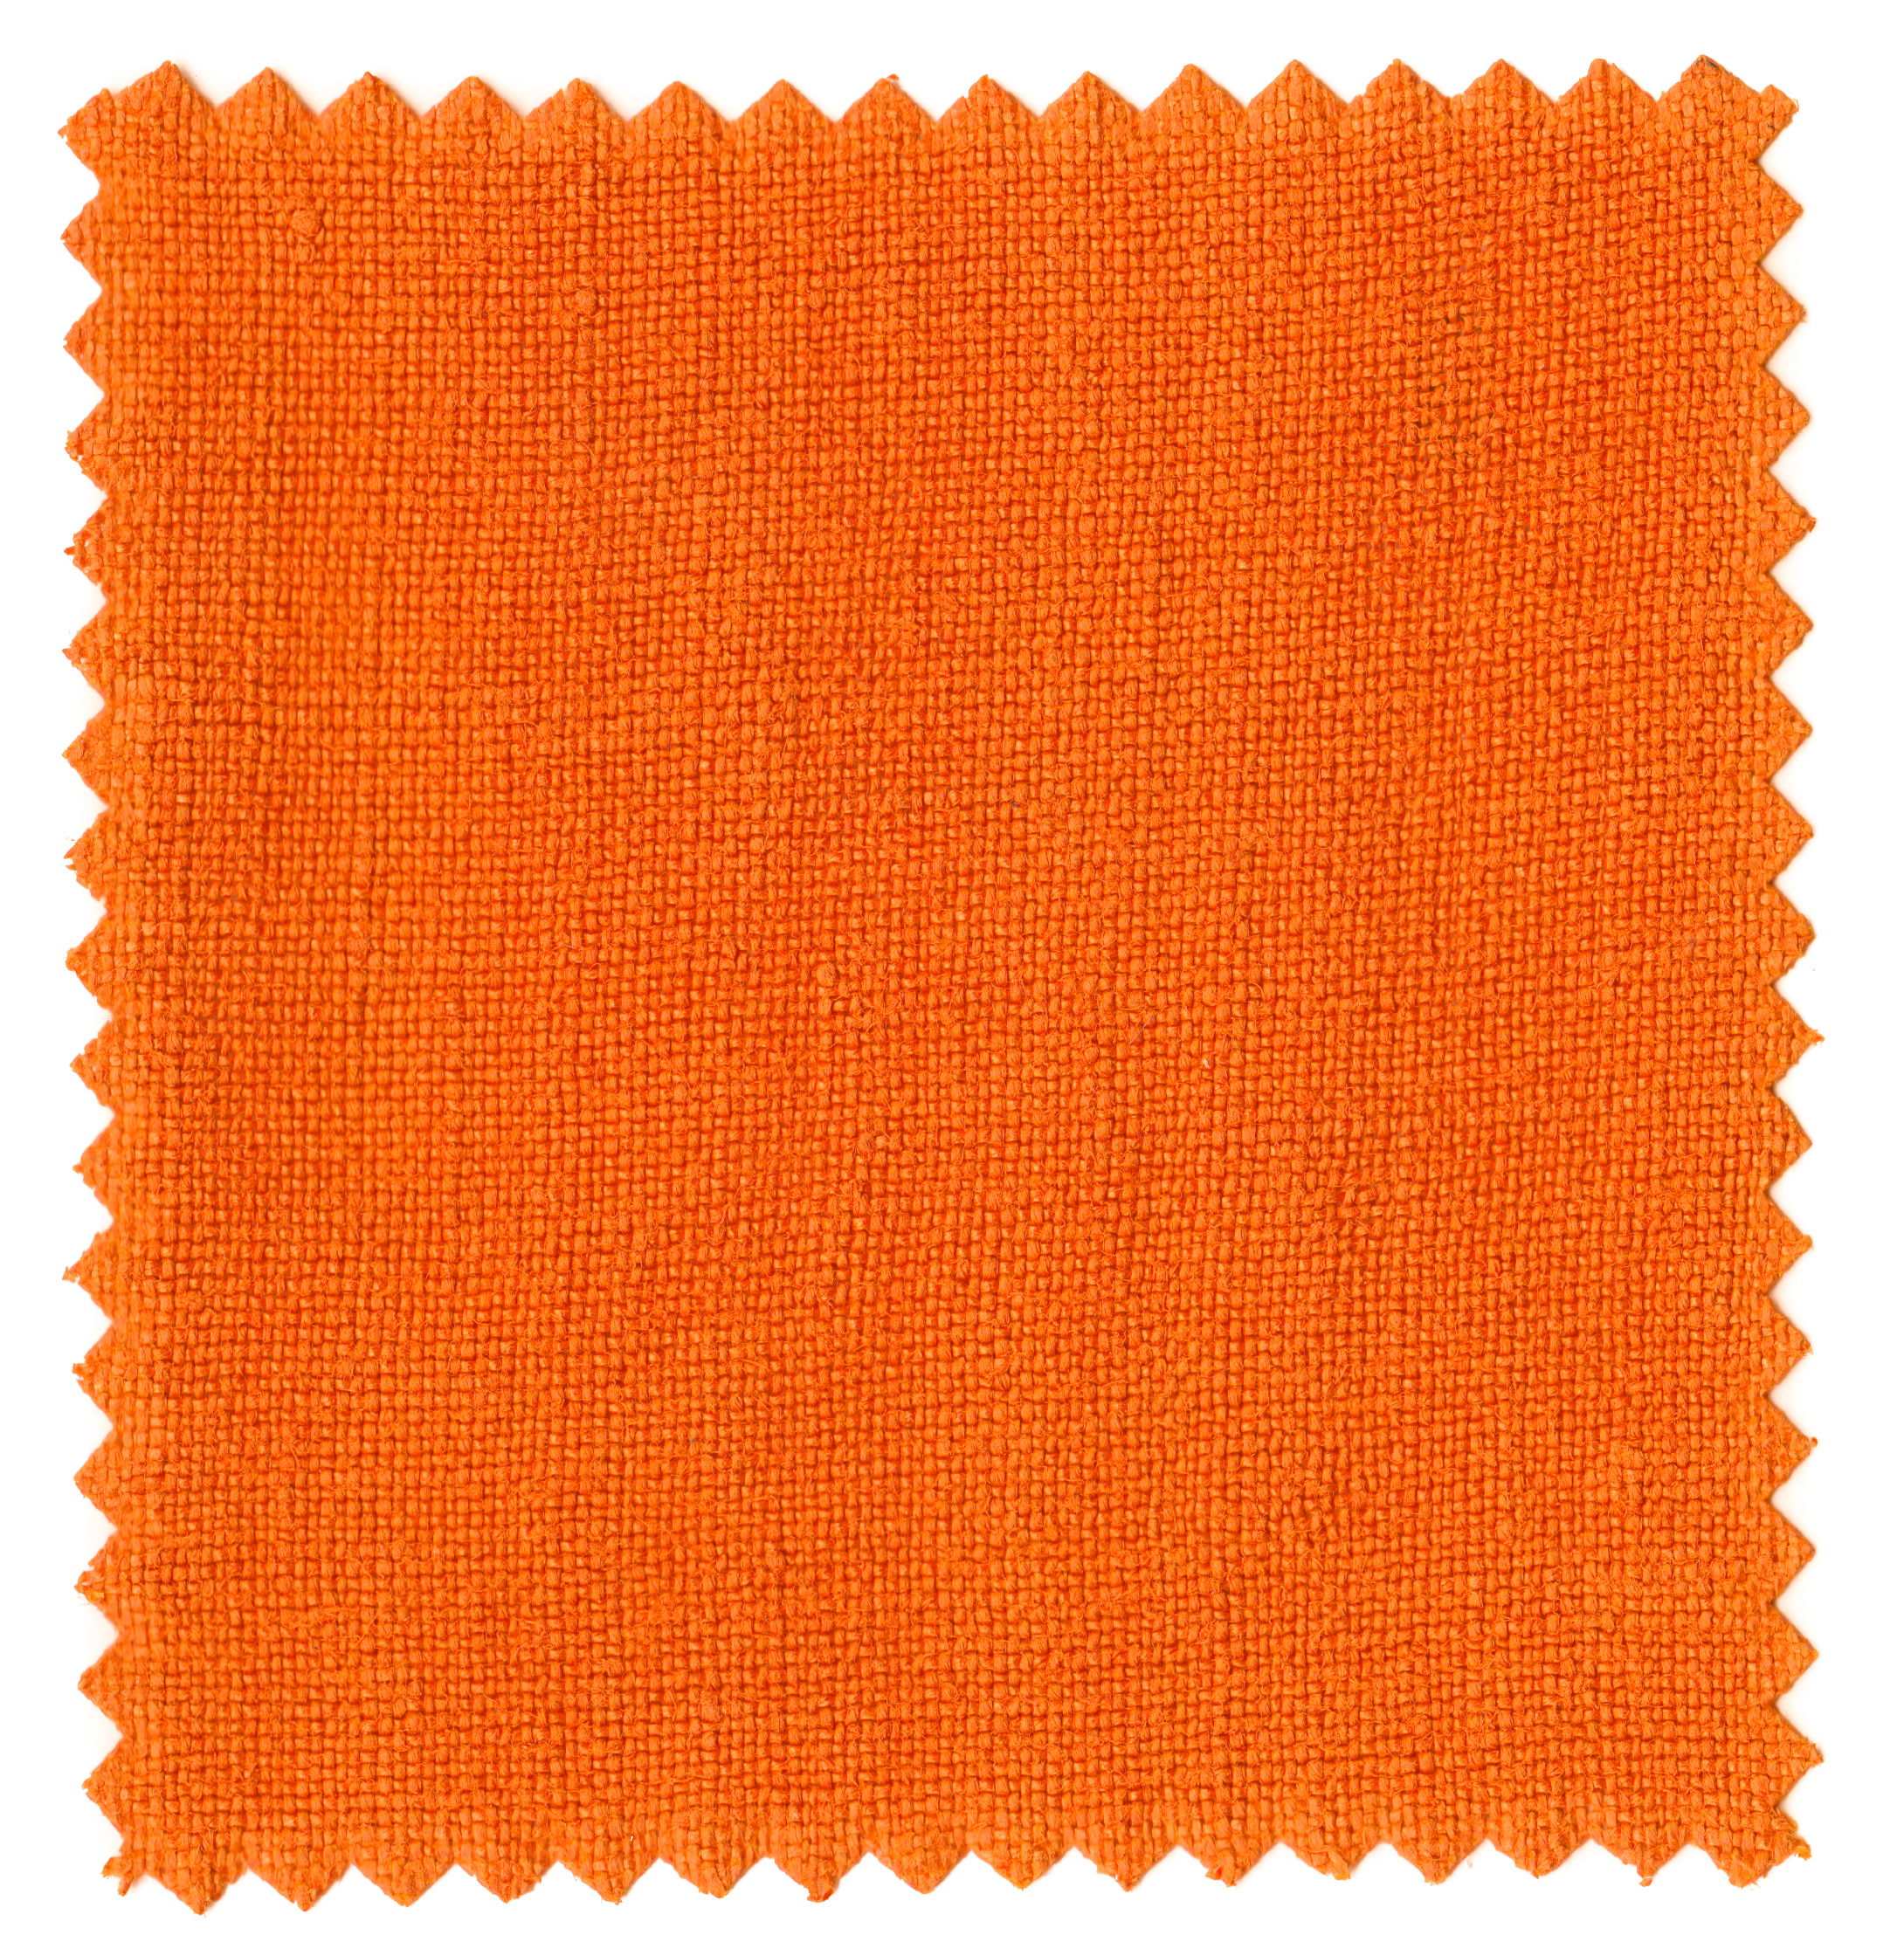 Saffron Umbers-3.jpg